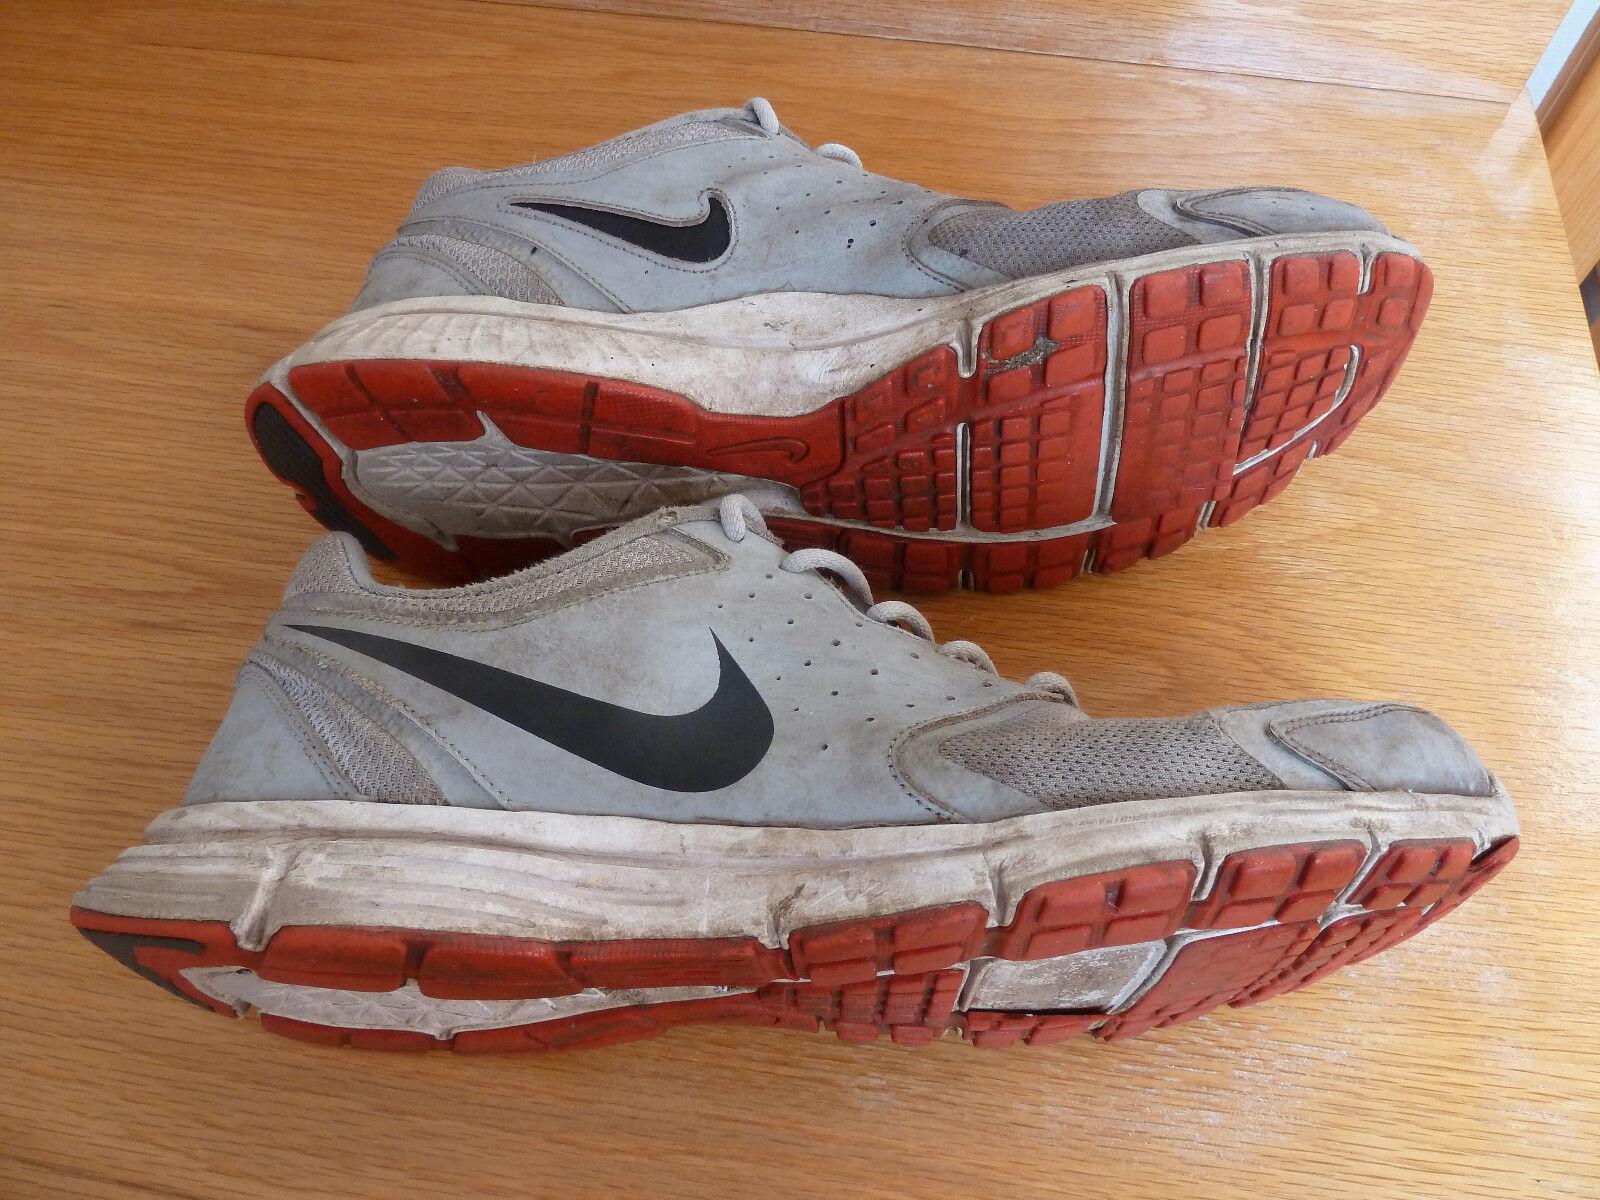 new arrival cb854 ccf30 100% Original Nike Nike Nike révolution UE, TAILLE 47,5/US 13/31 cm-Nike  2a053e